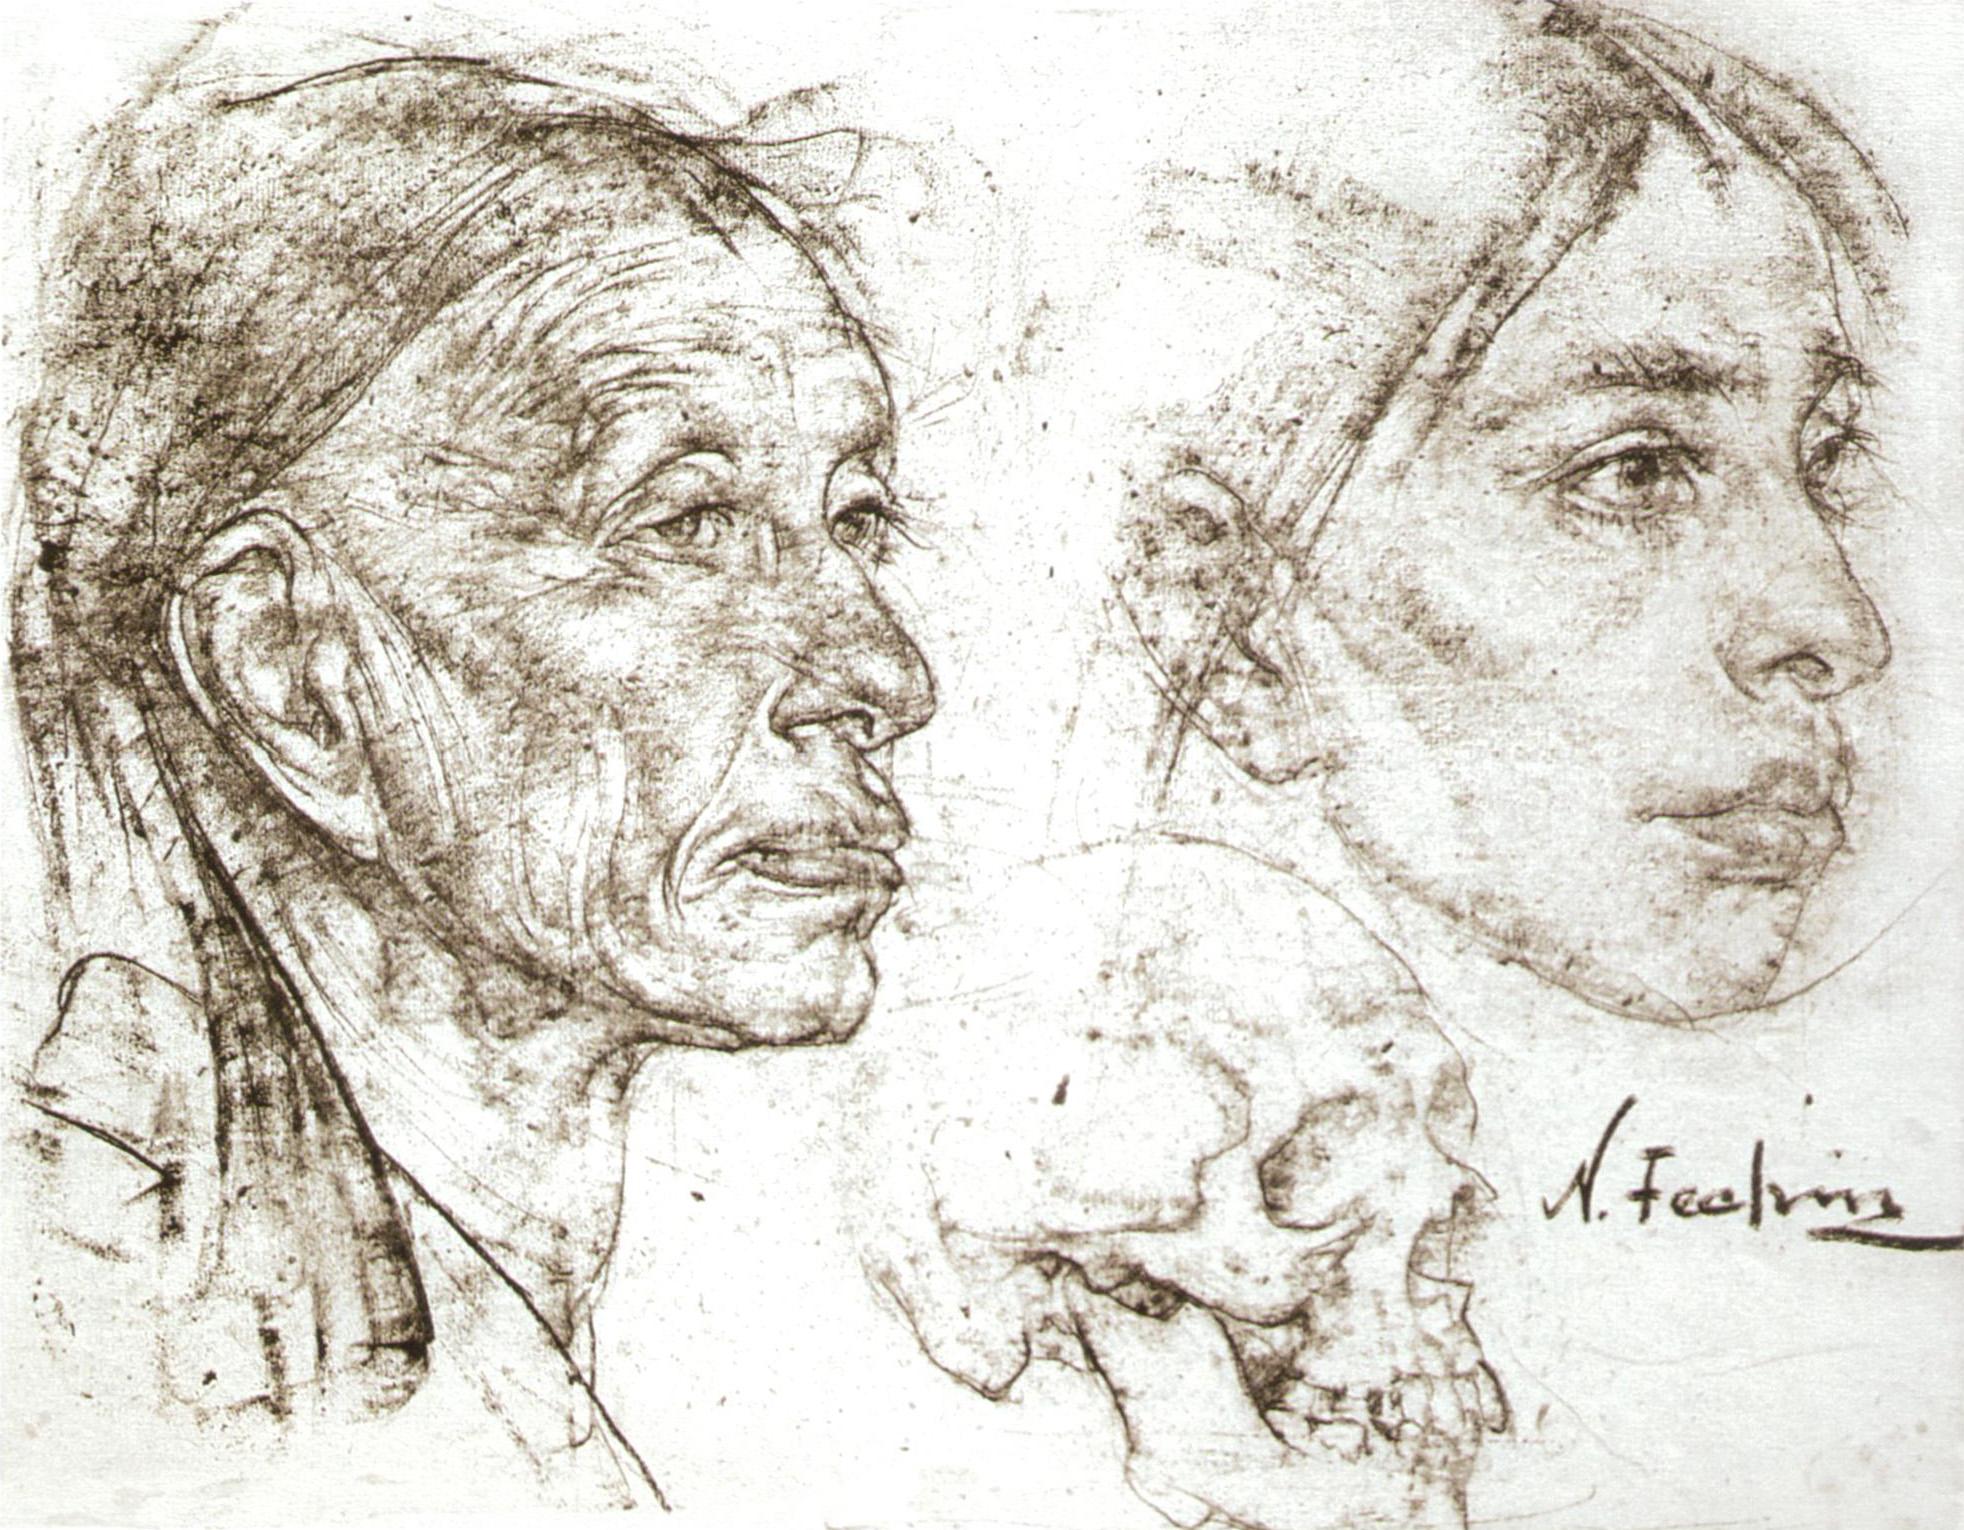 http://cp16.nevsepic.com.ua/253/25293/1444197521-shtudii-golov-i-cherepa.-indejskie-nabroski-19331955.jpg